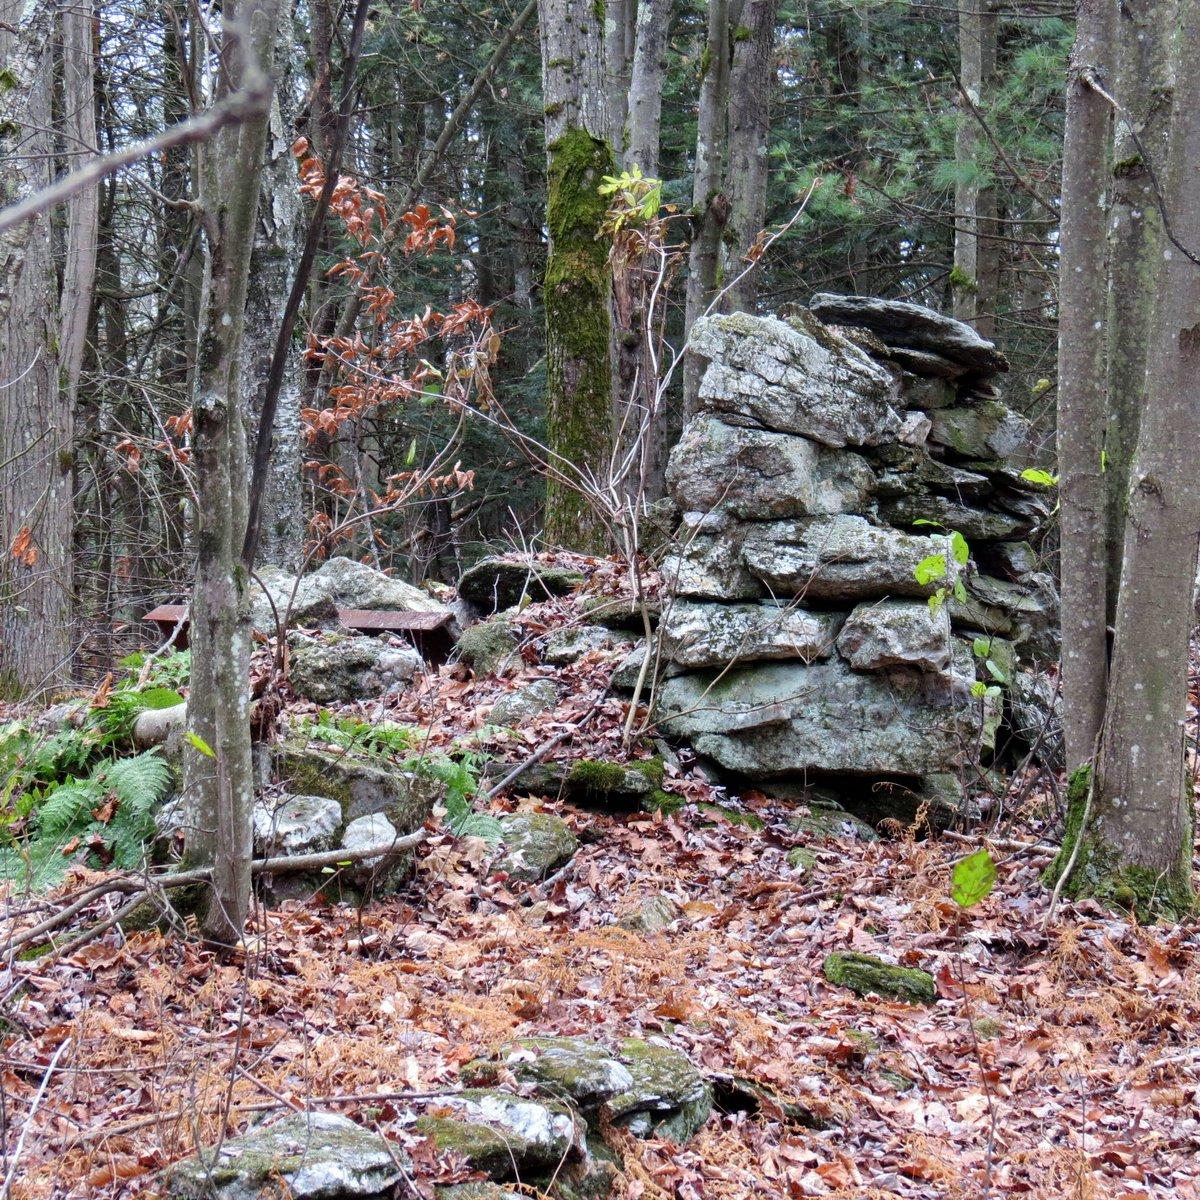 9. Foundation Stones